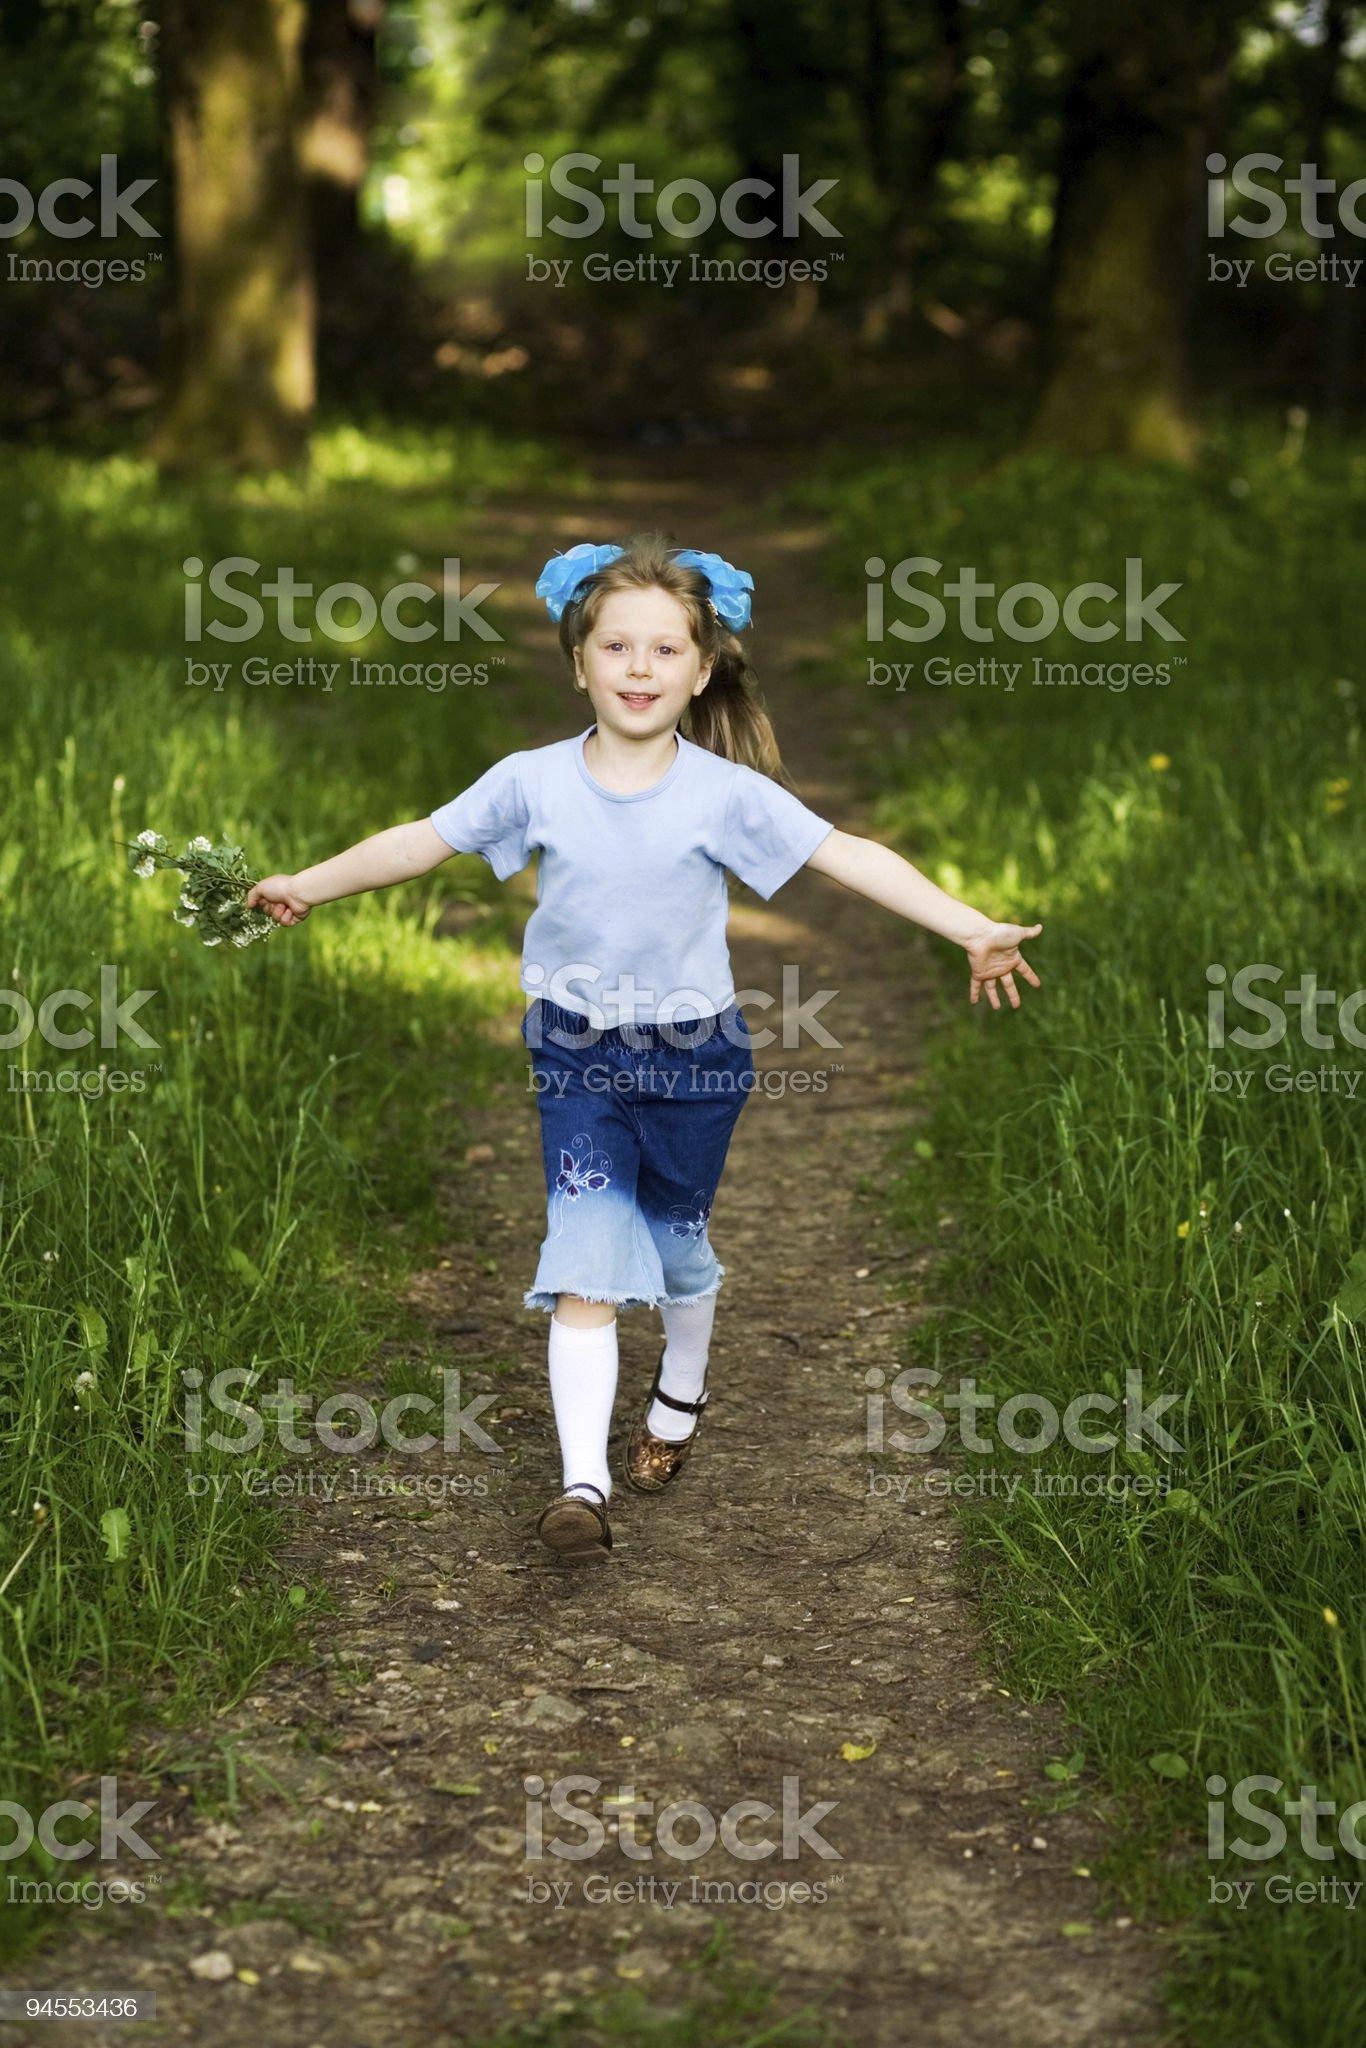 Girl running in park royalty-free stock photo